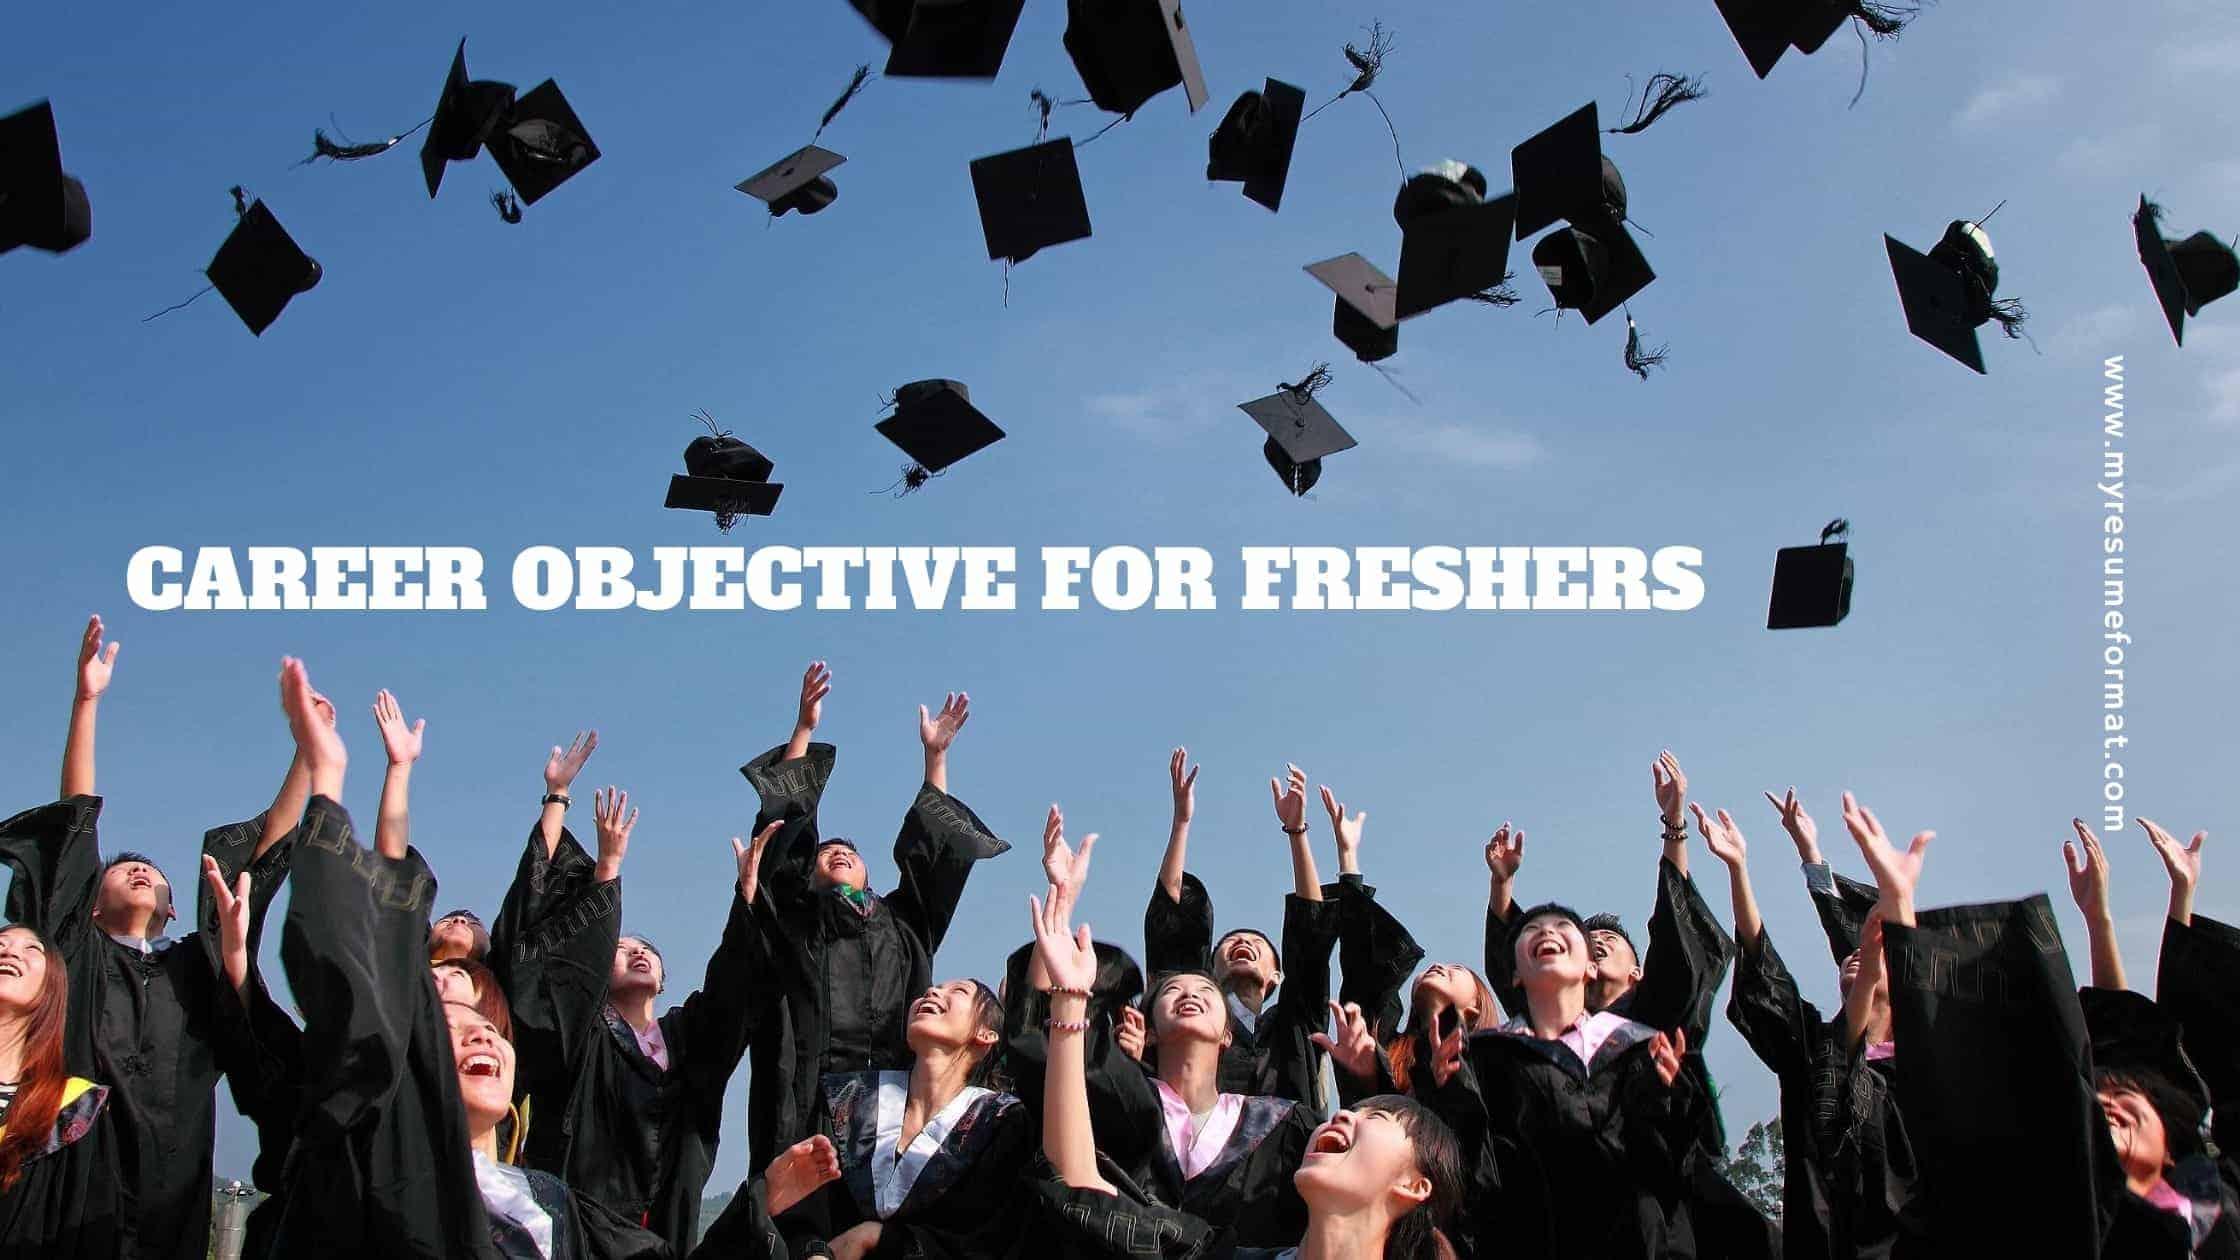 career objective fresher